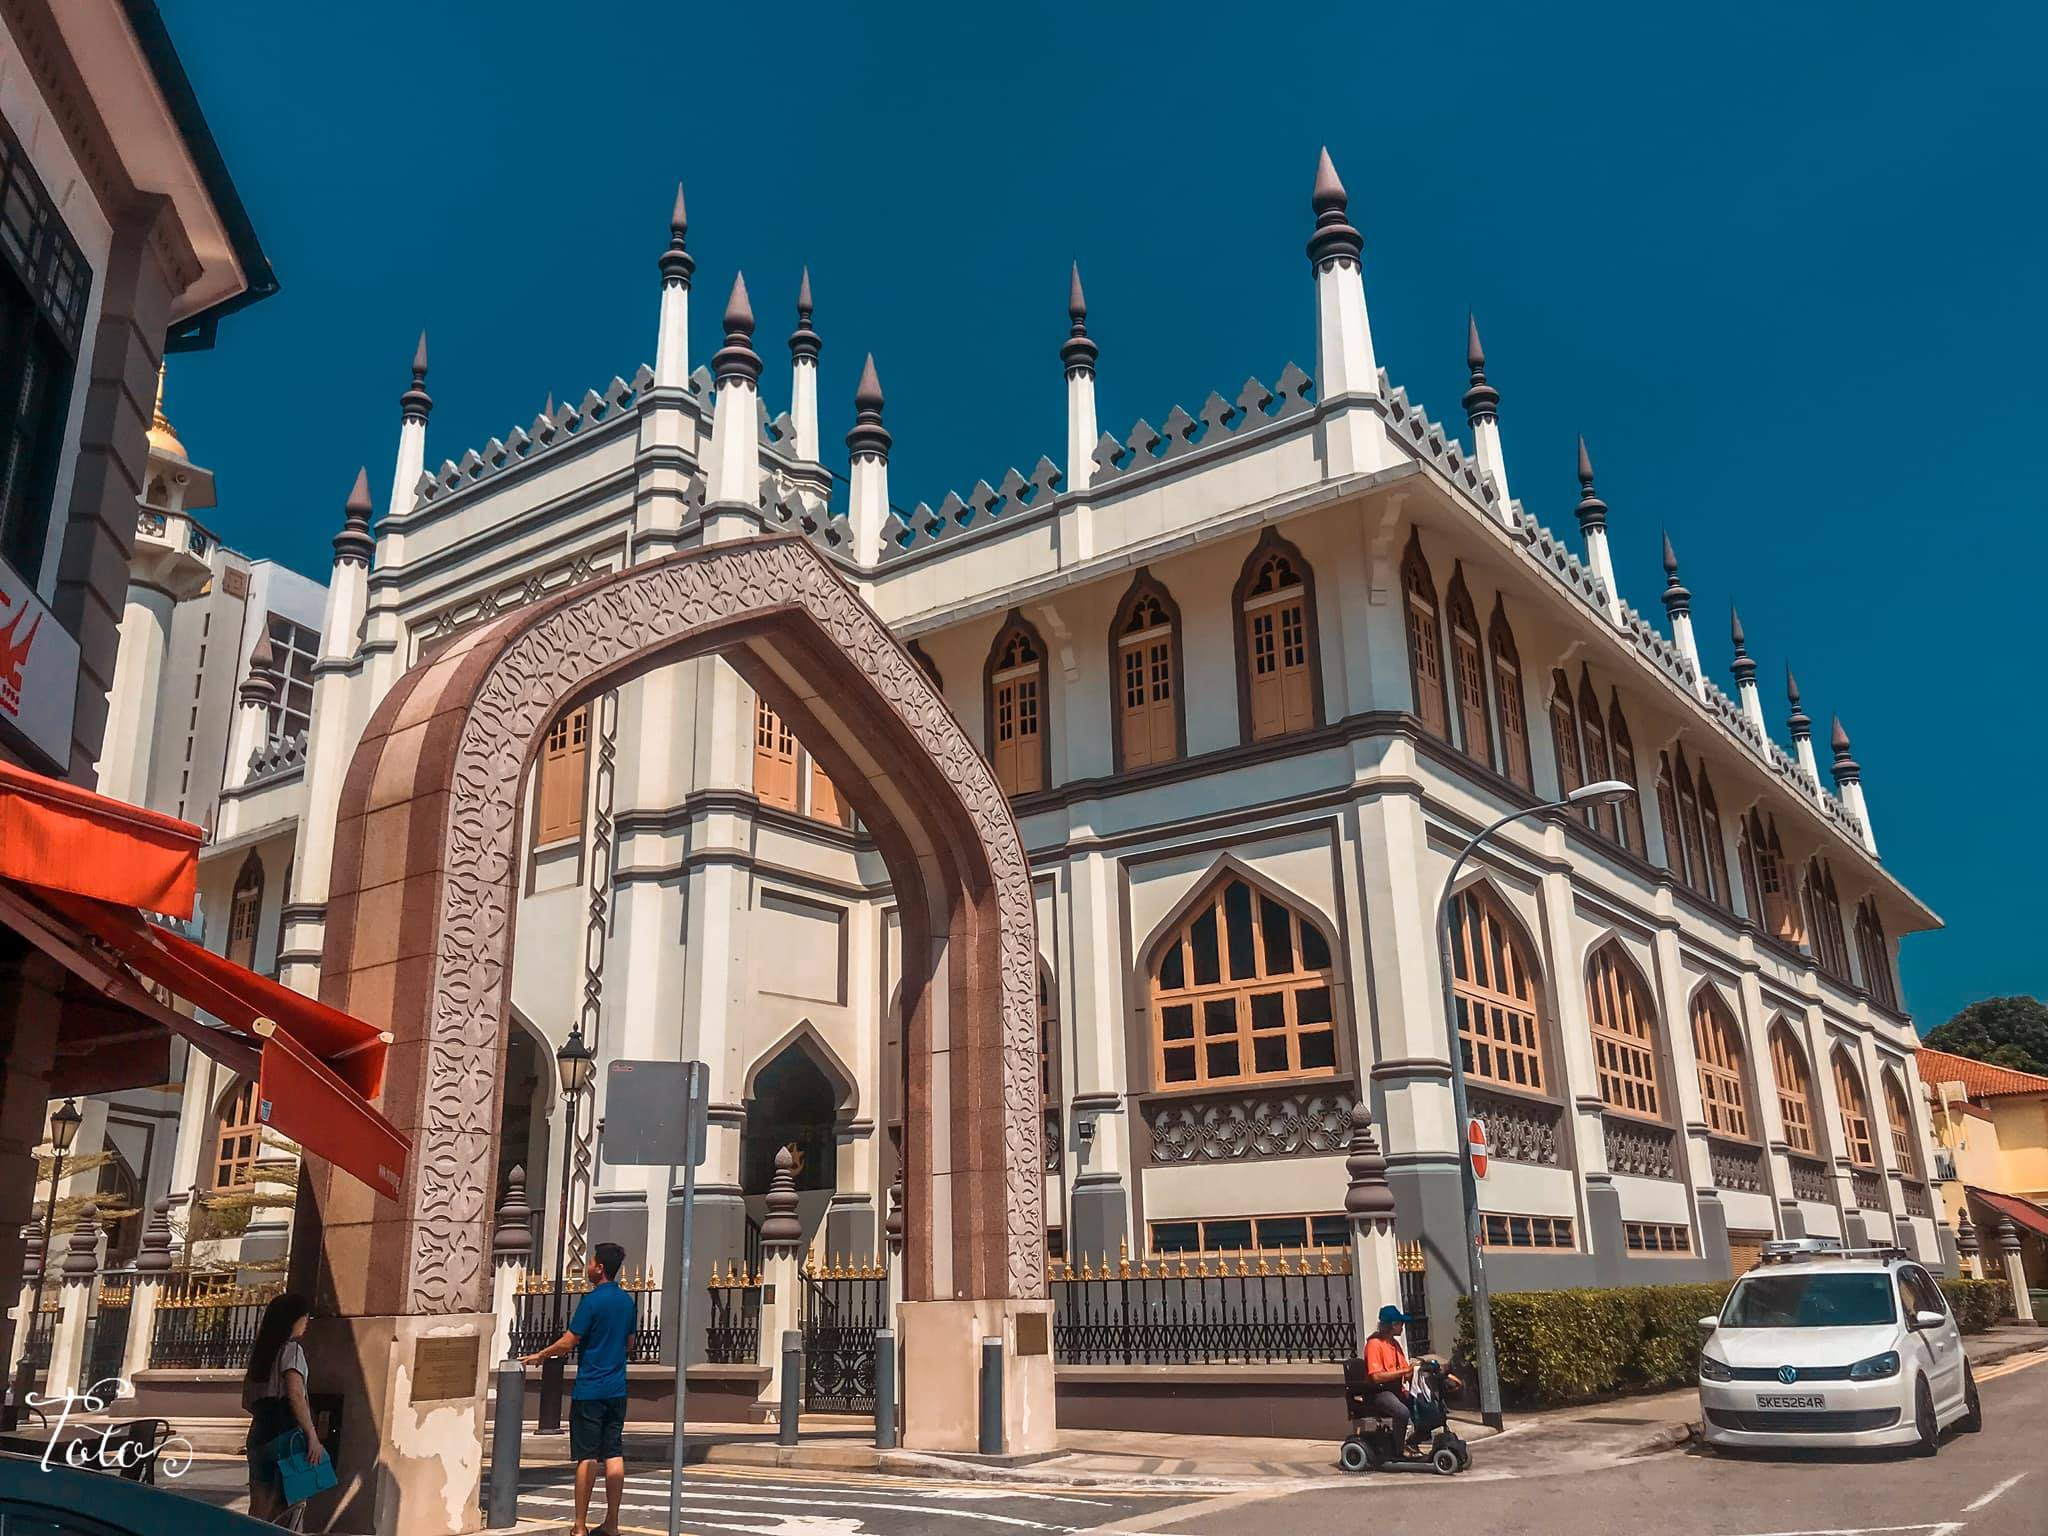 kiến trúc hồi giáo tại little india